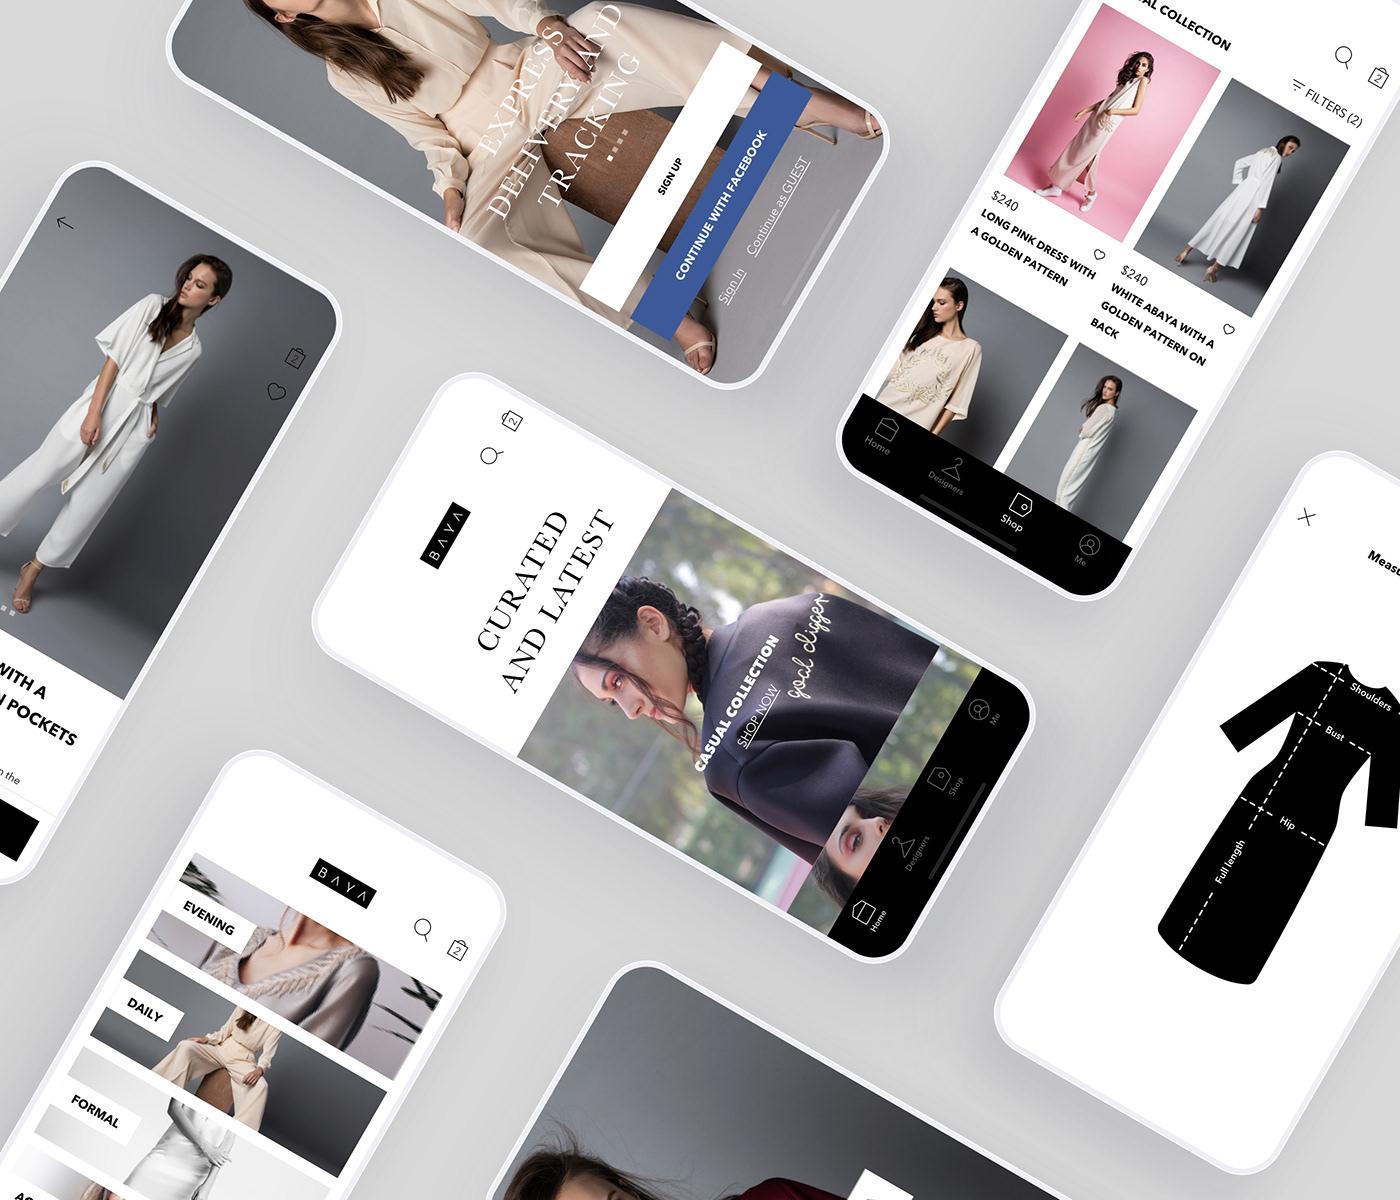 Mobile shopping app iOS screens